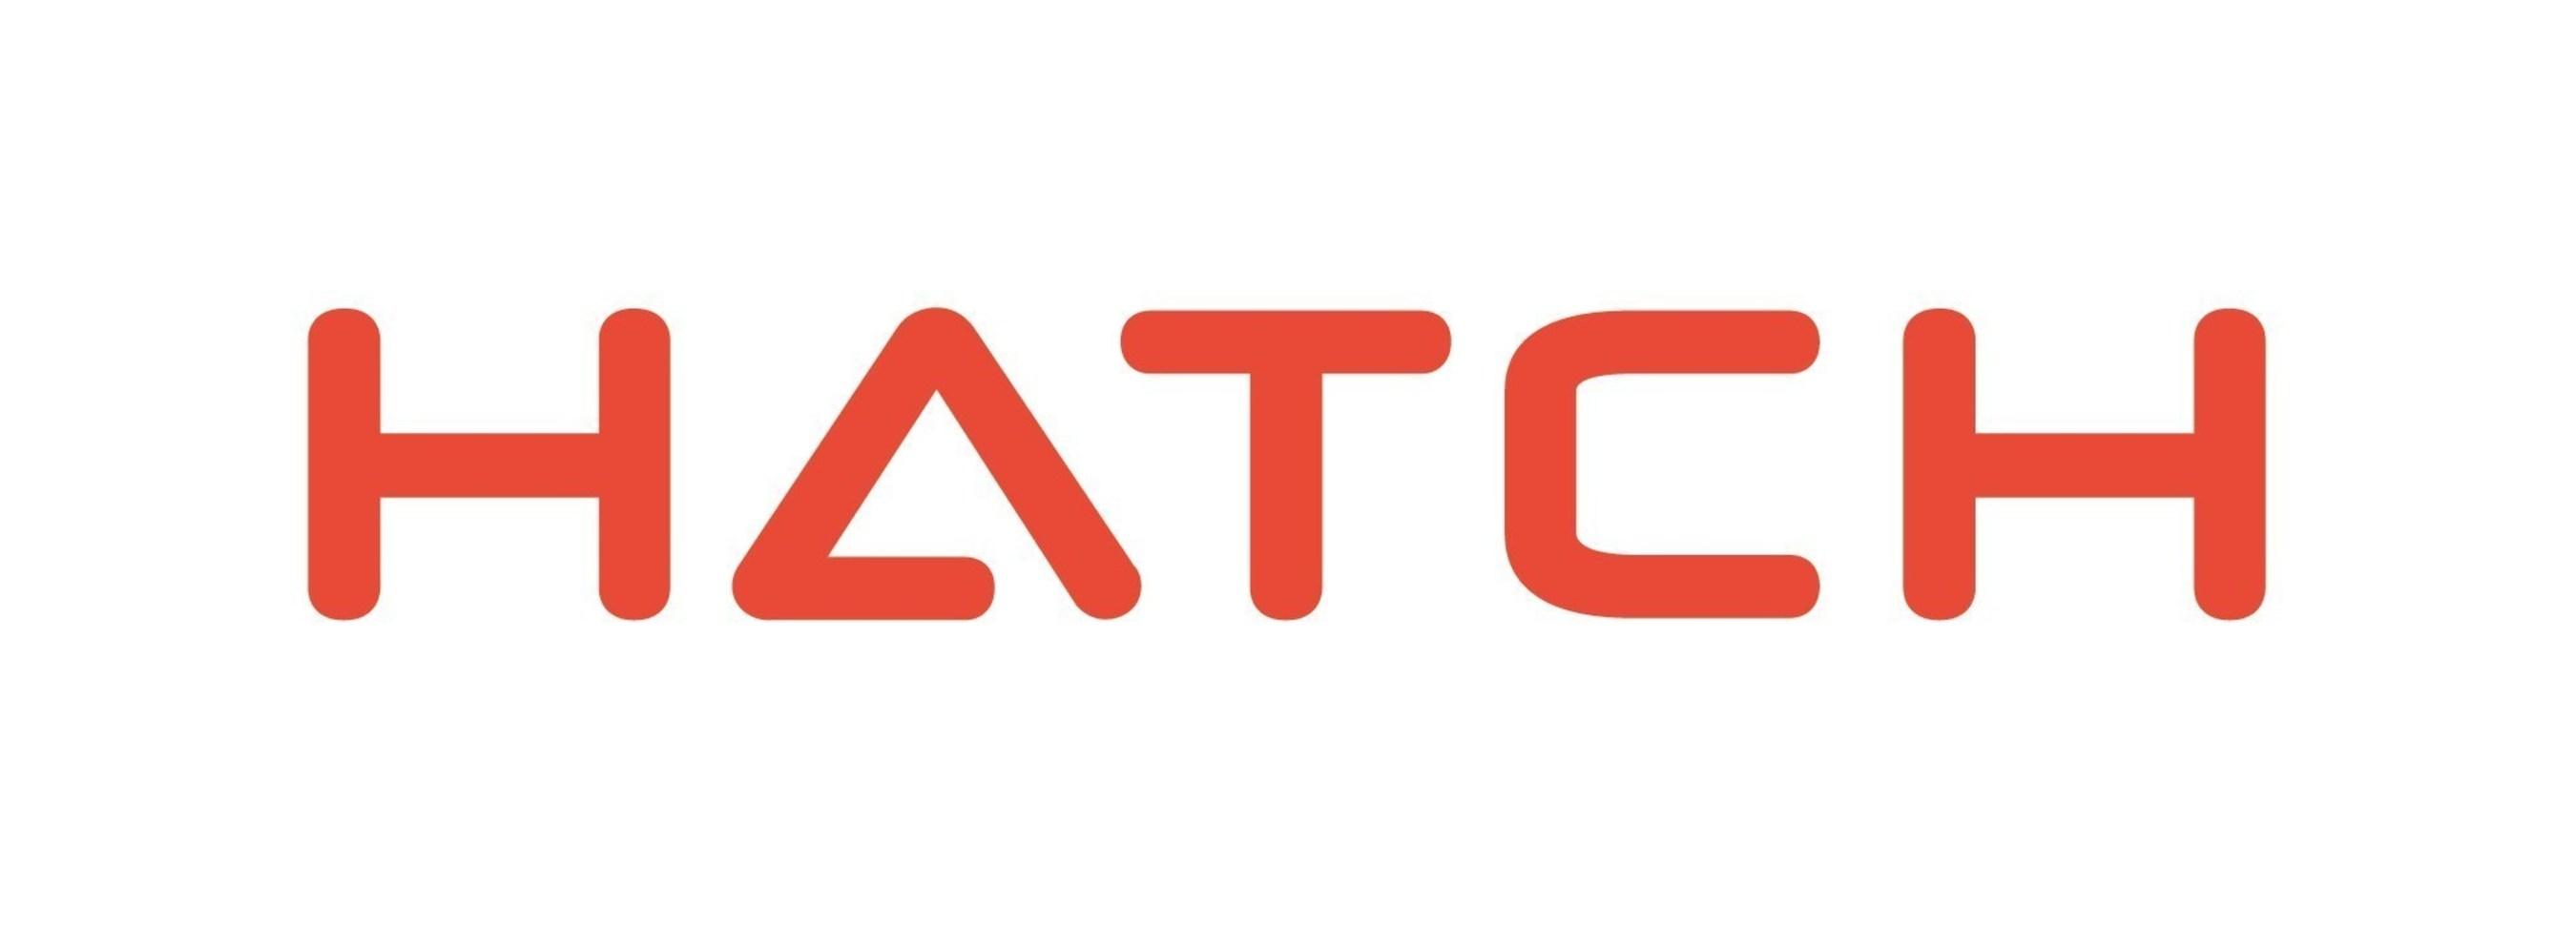 Hatch marks new era of positive change